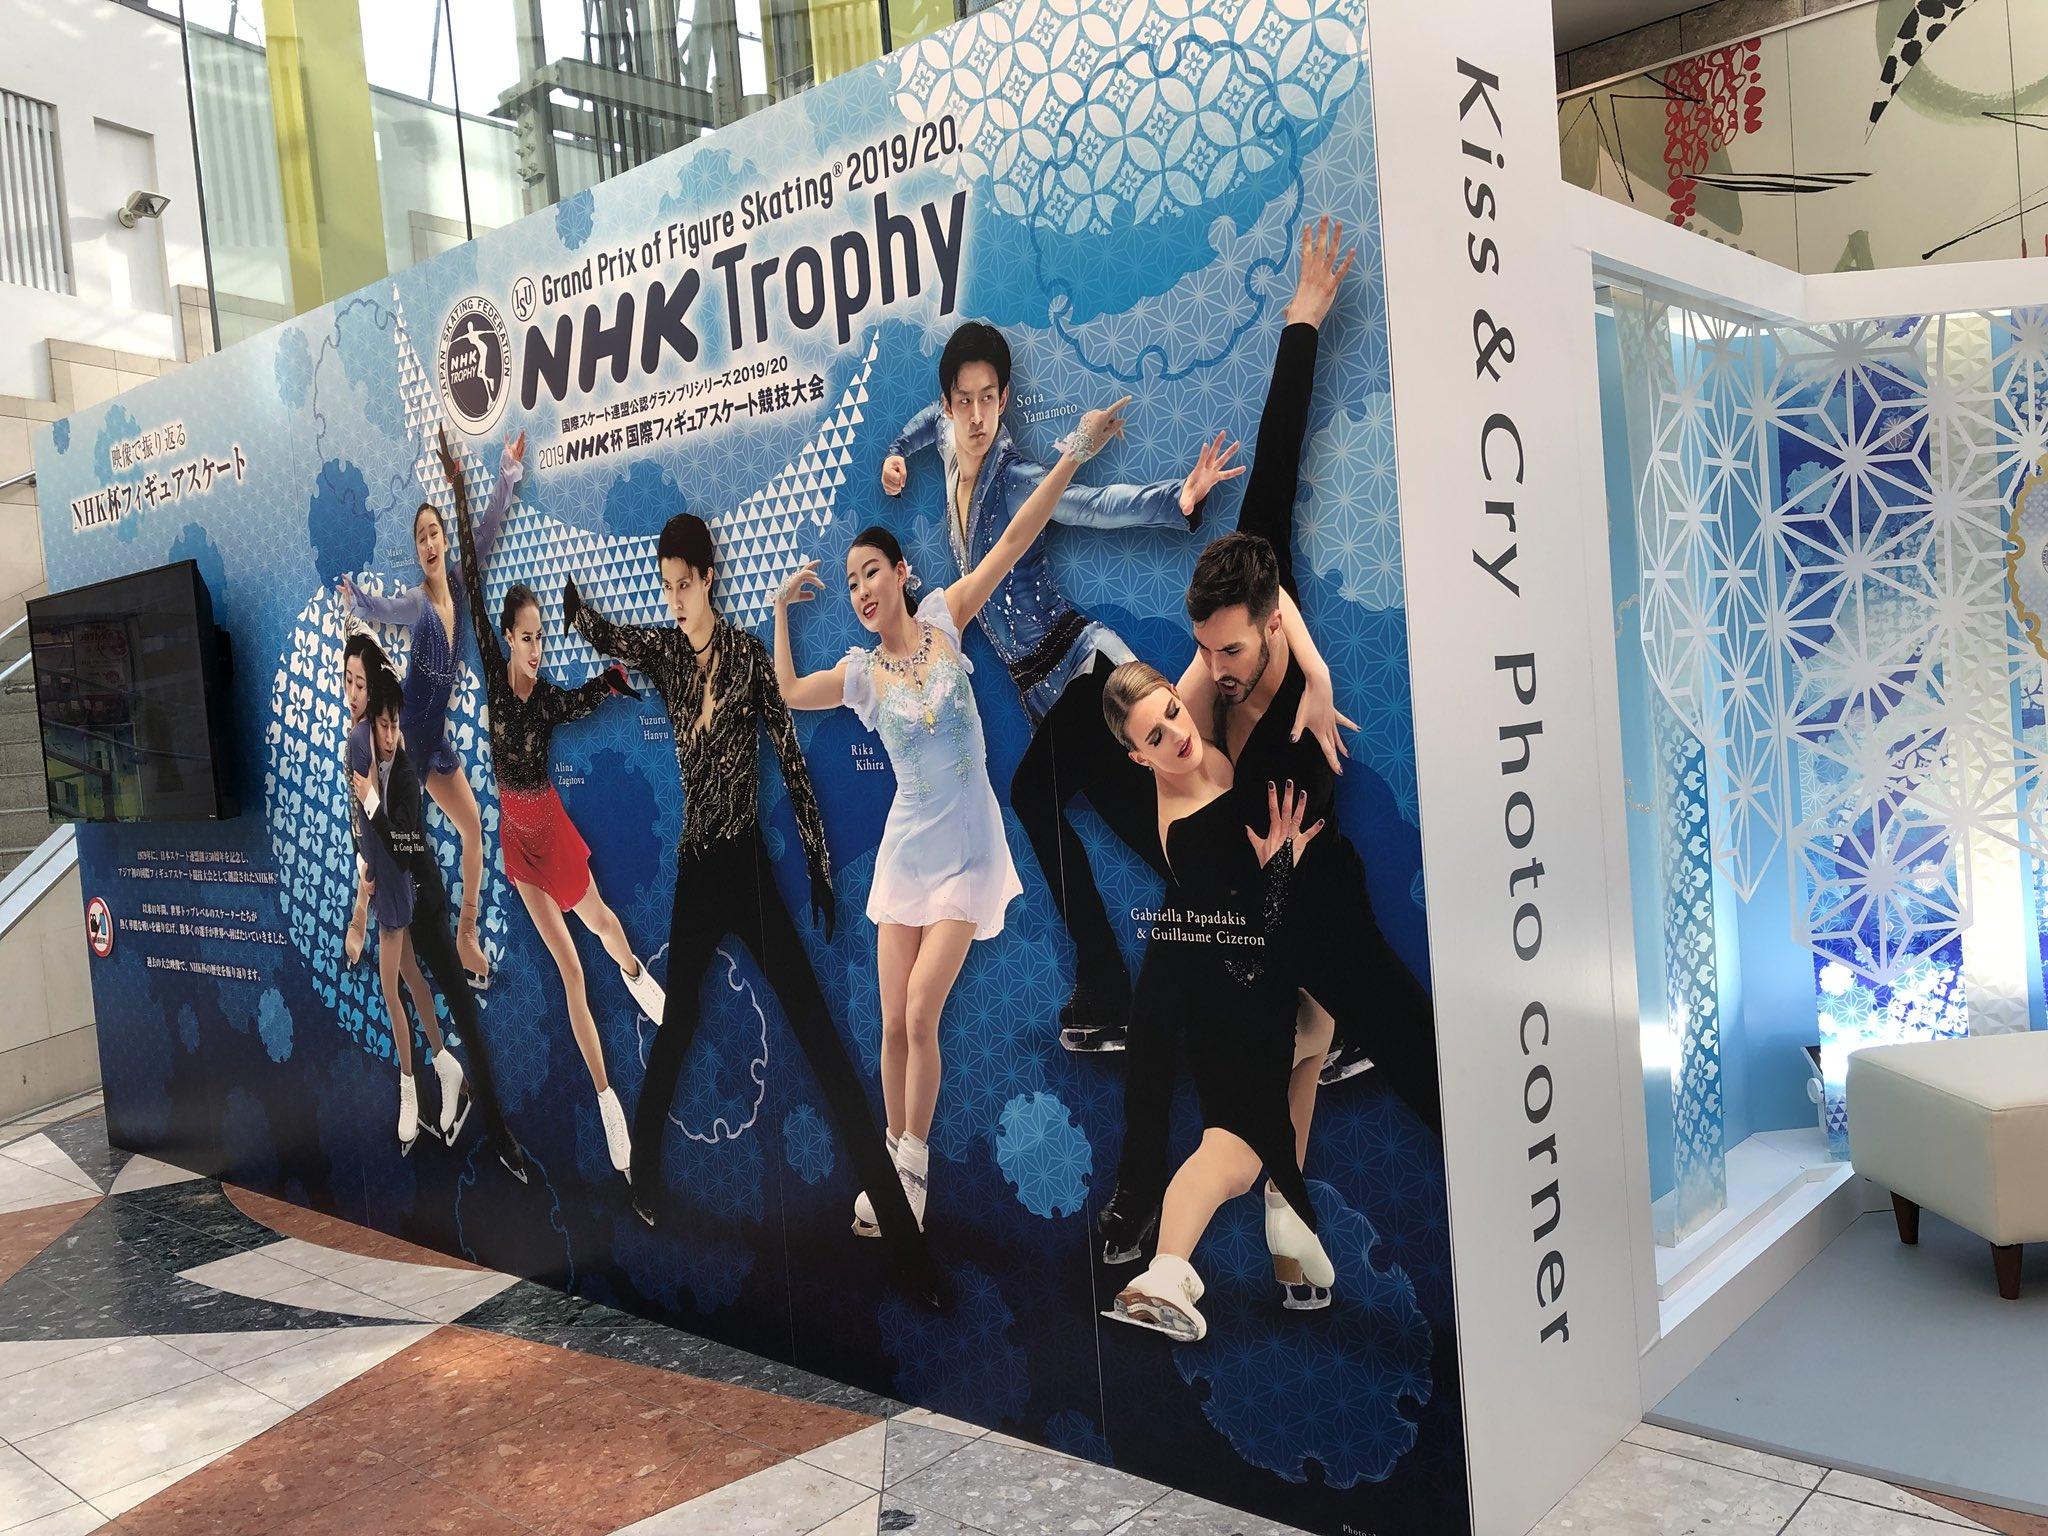 GP - 6 этап. NHK Trophy Sapporo / JPN November 22-24, 2019 EJdTZ-mUUAADleT?format=jpg&name=4096x4096